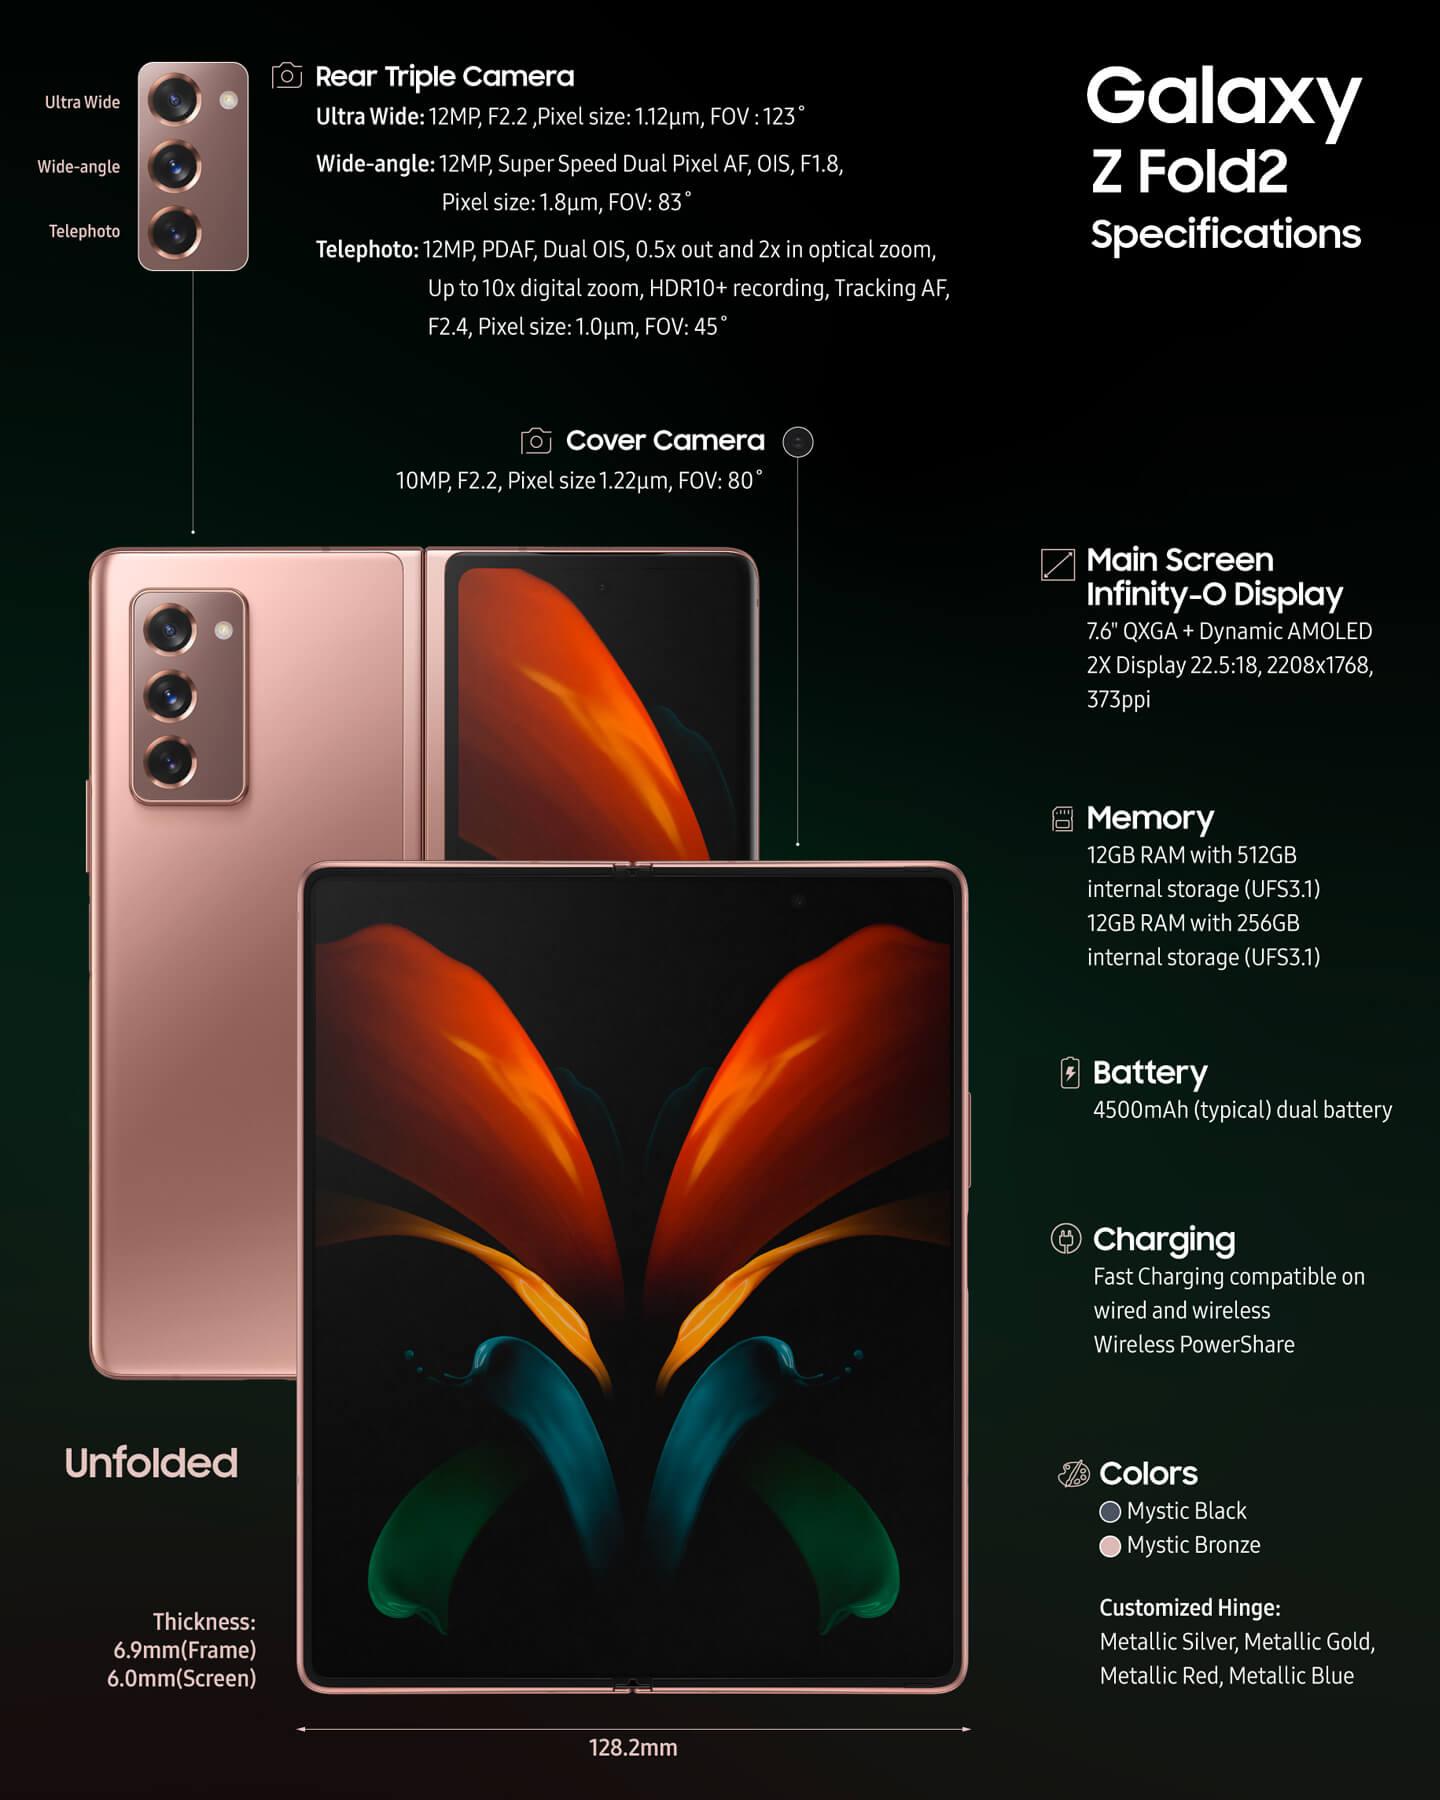 Samsung Galaxy Z Fold 2 specs